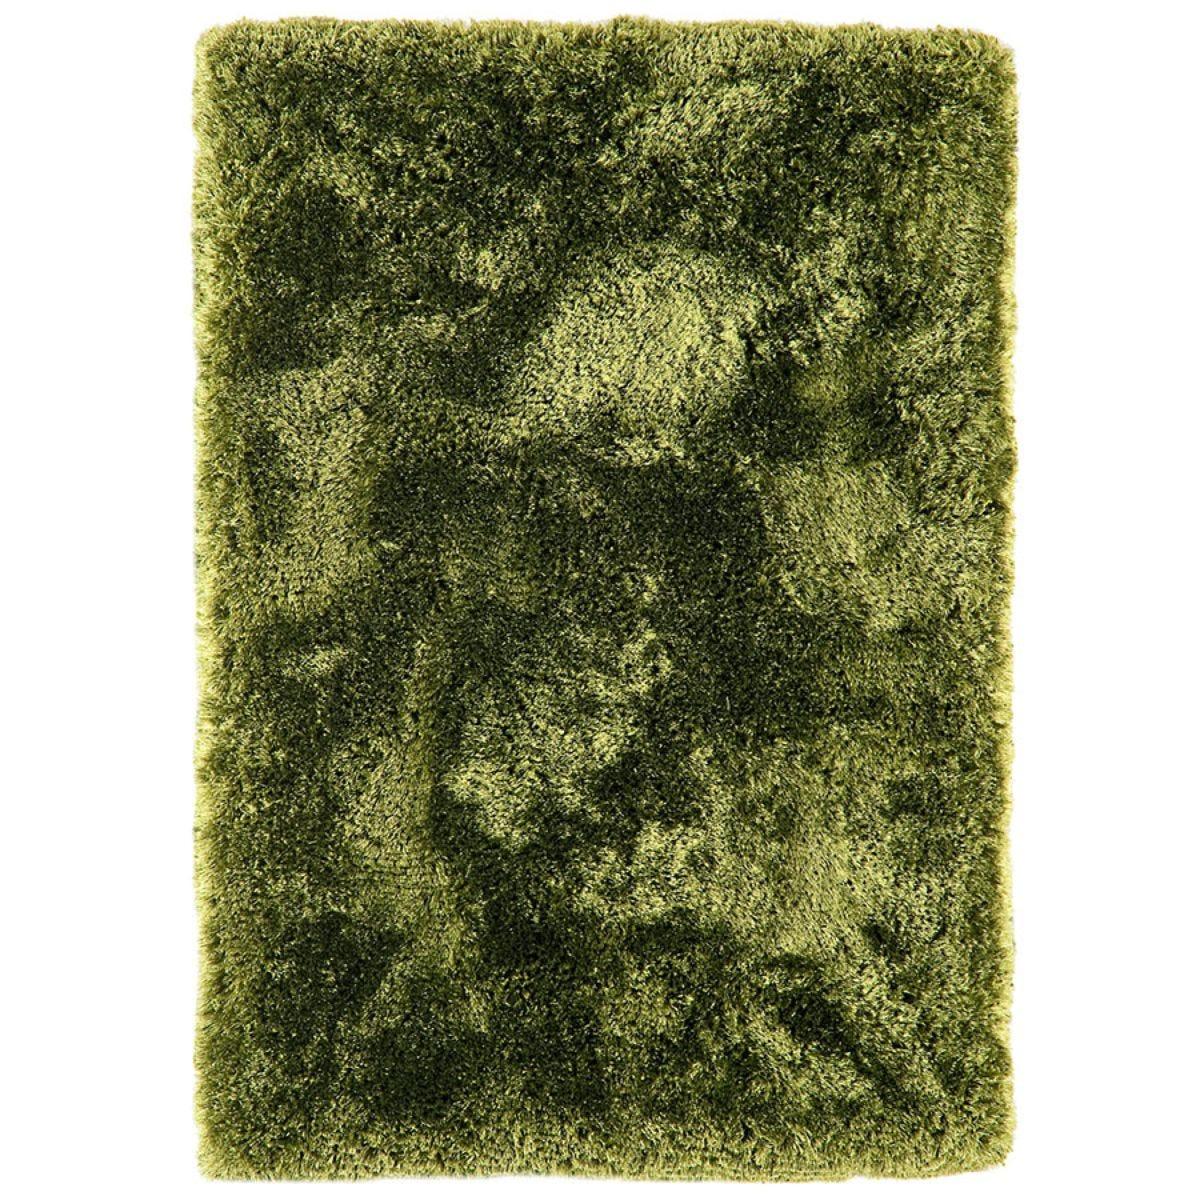 Asiatic Plush Shaggy Rug, 120 x 170cm - Green